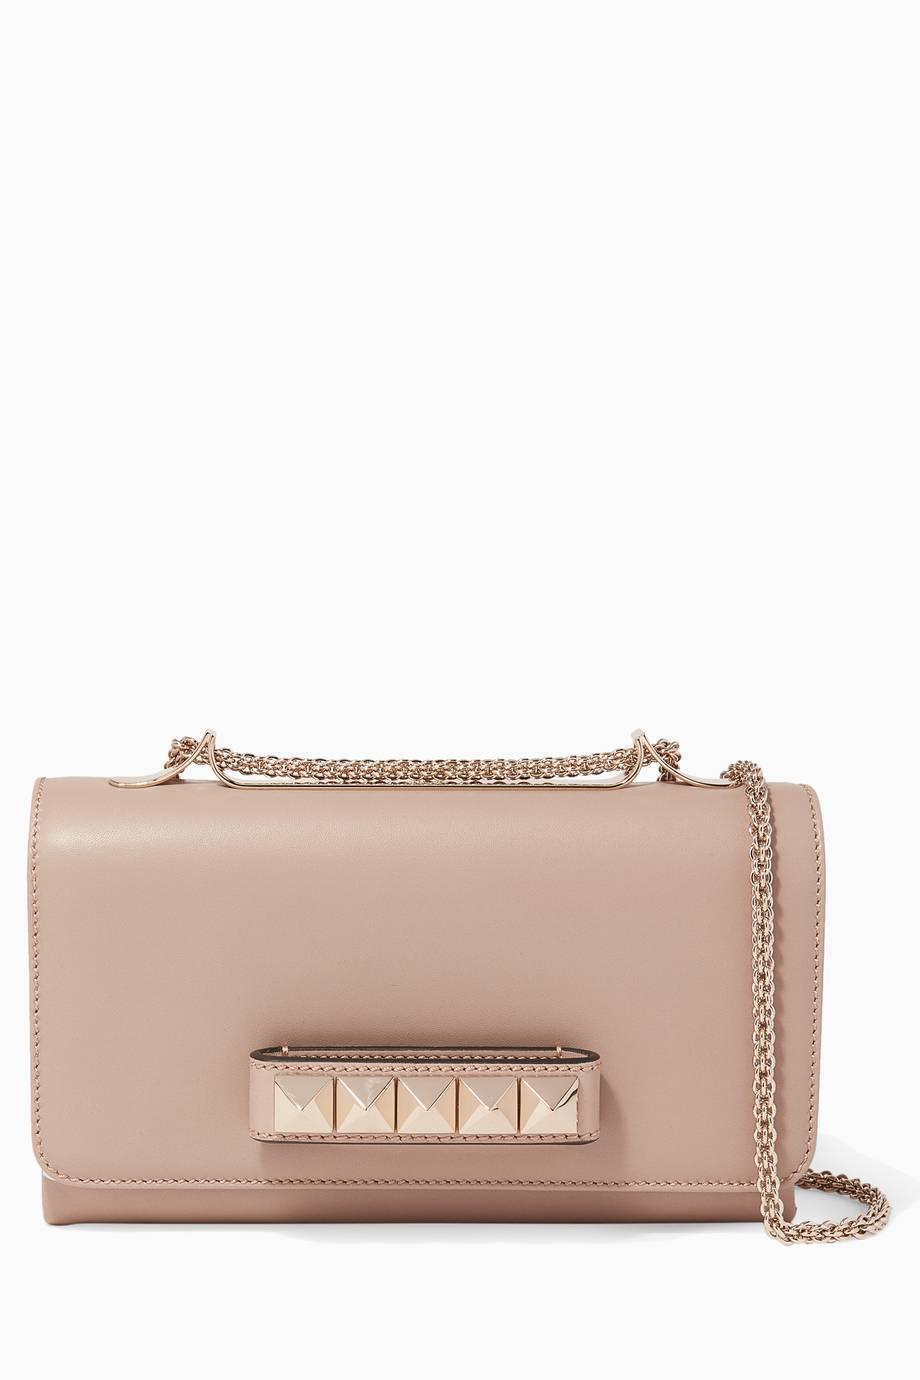 Shop Luxury Valentino Blush Va-Va-Voom Chain Shoulder Bag  7a690e1af80f7